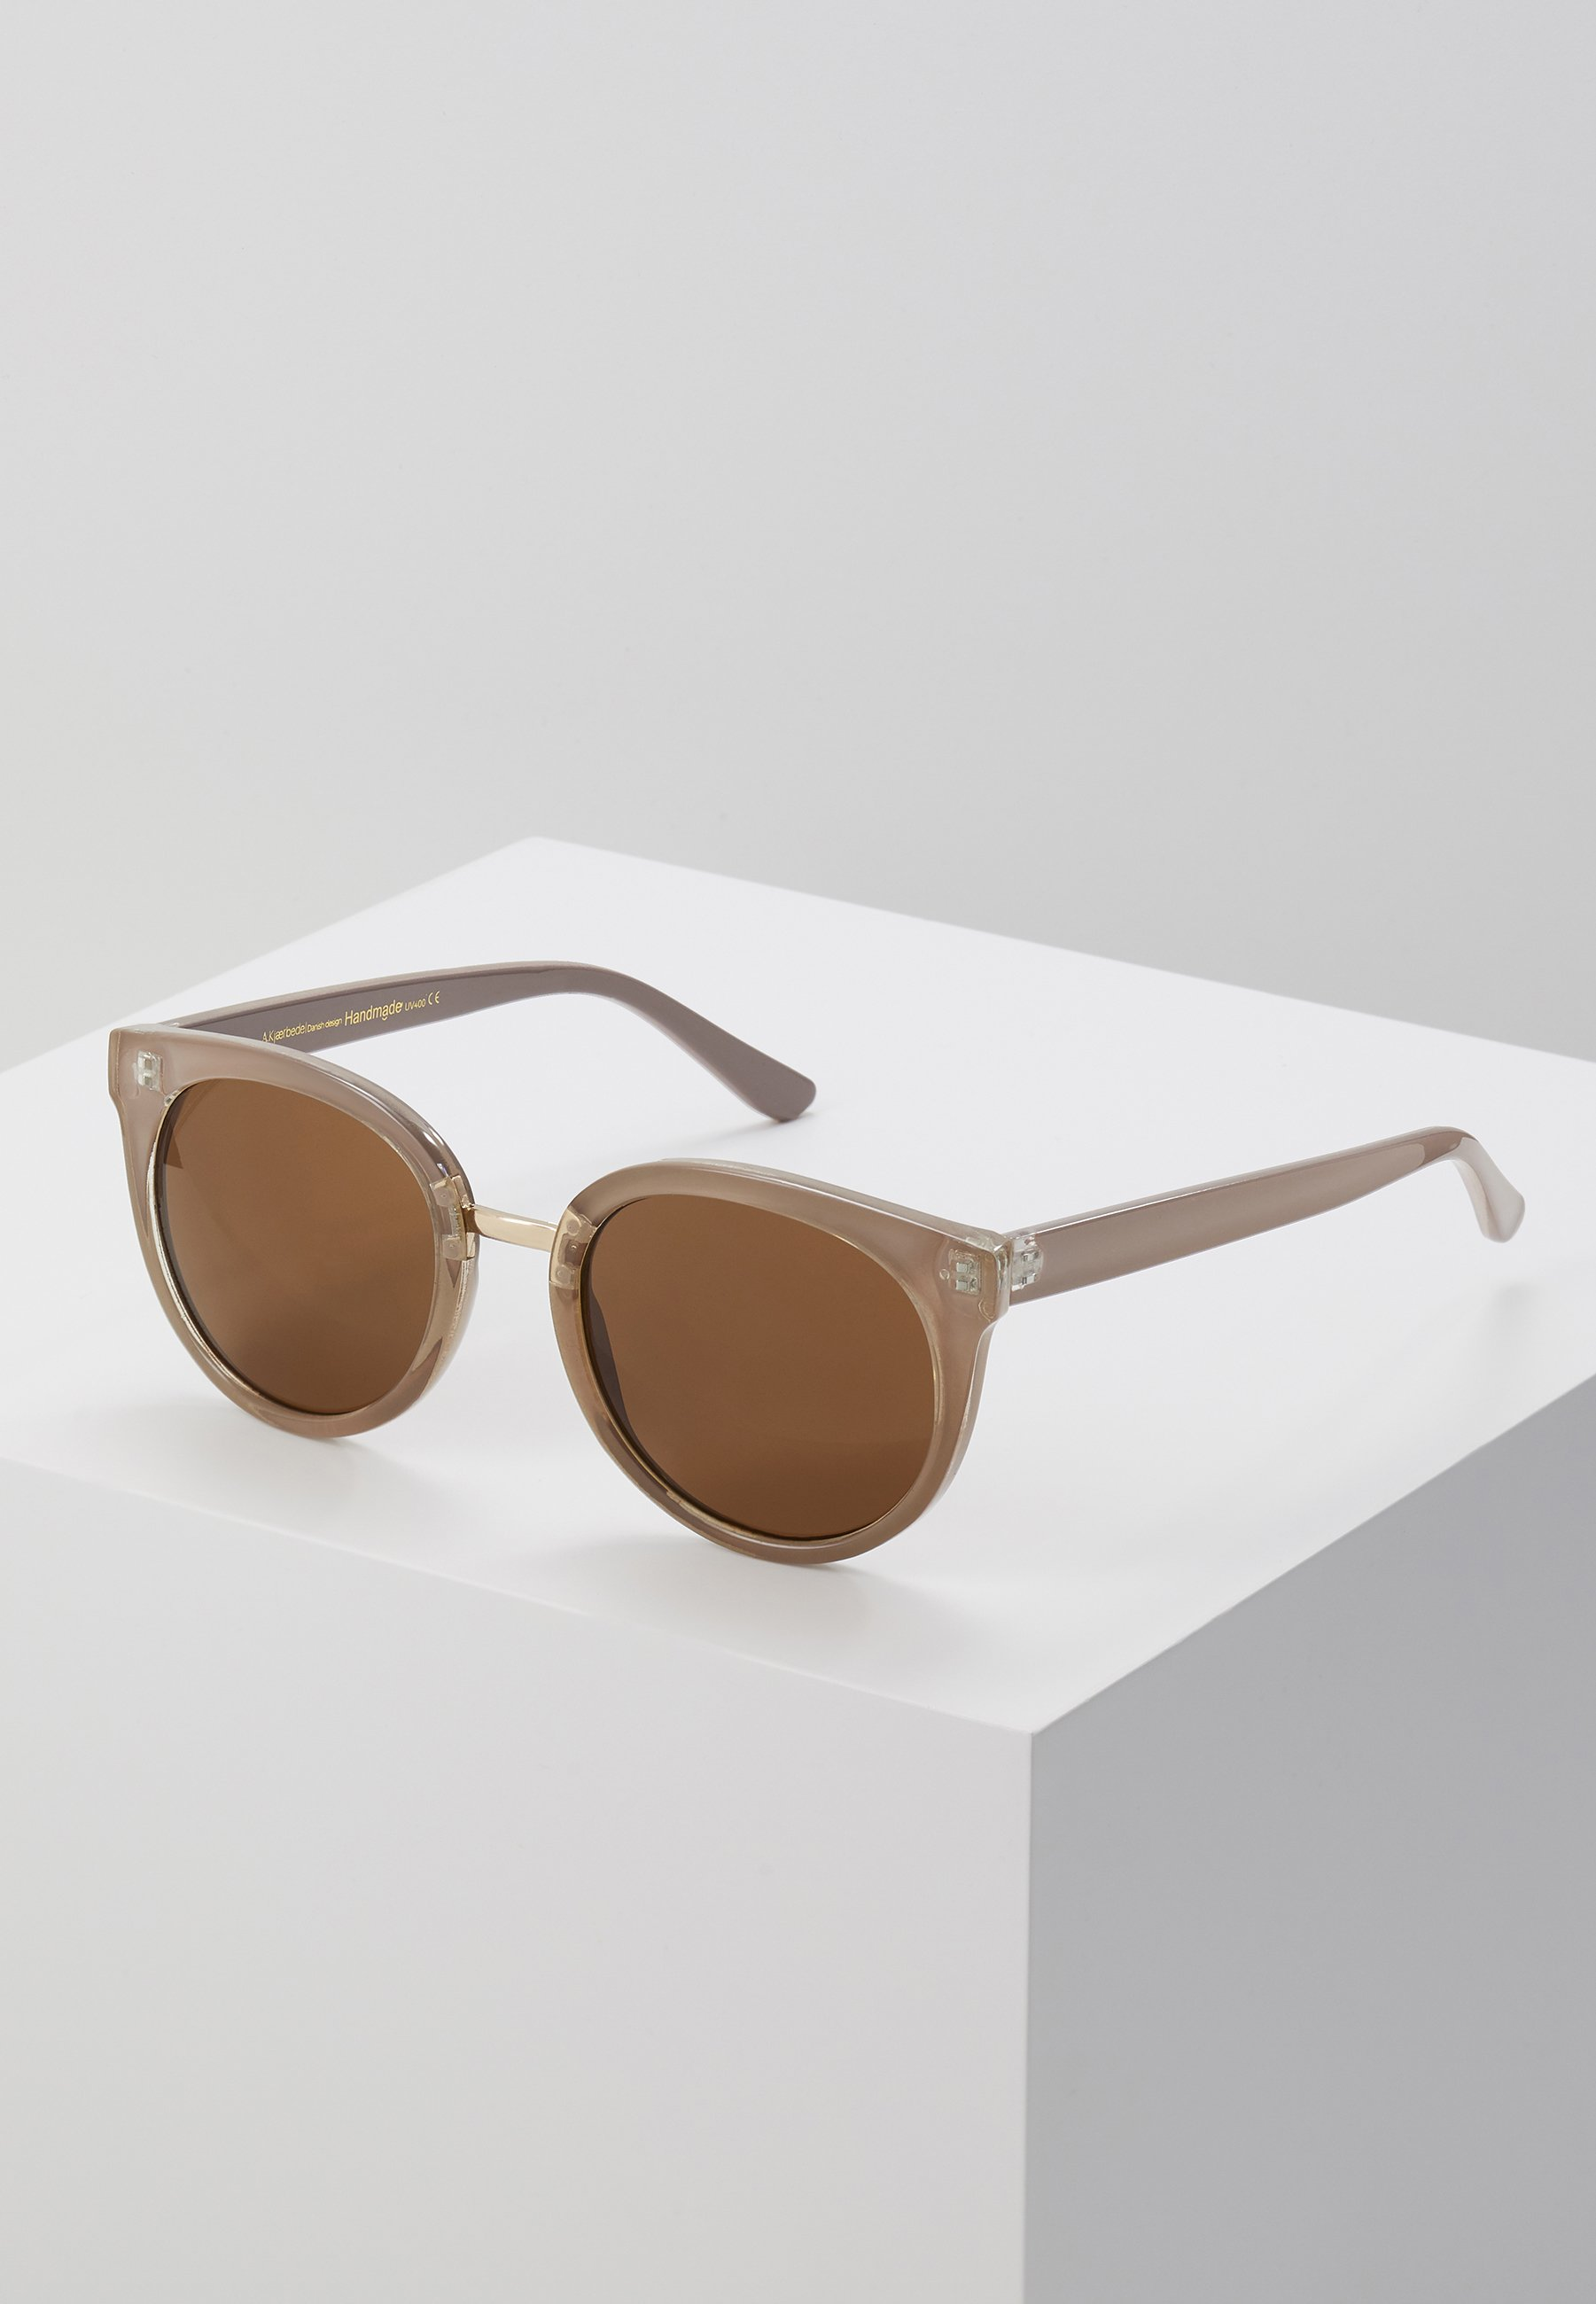 A.Kjærbede Sunglasses - light grey